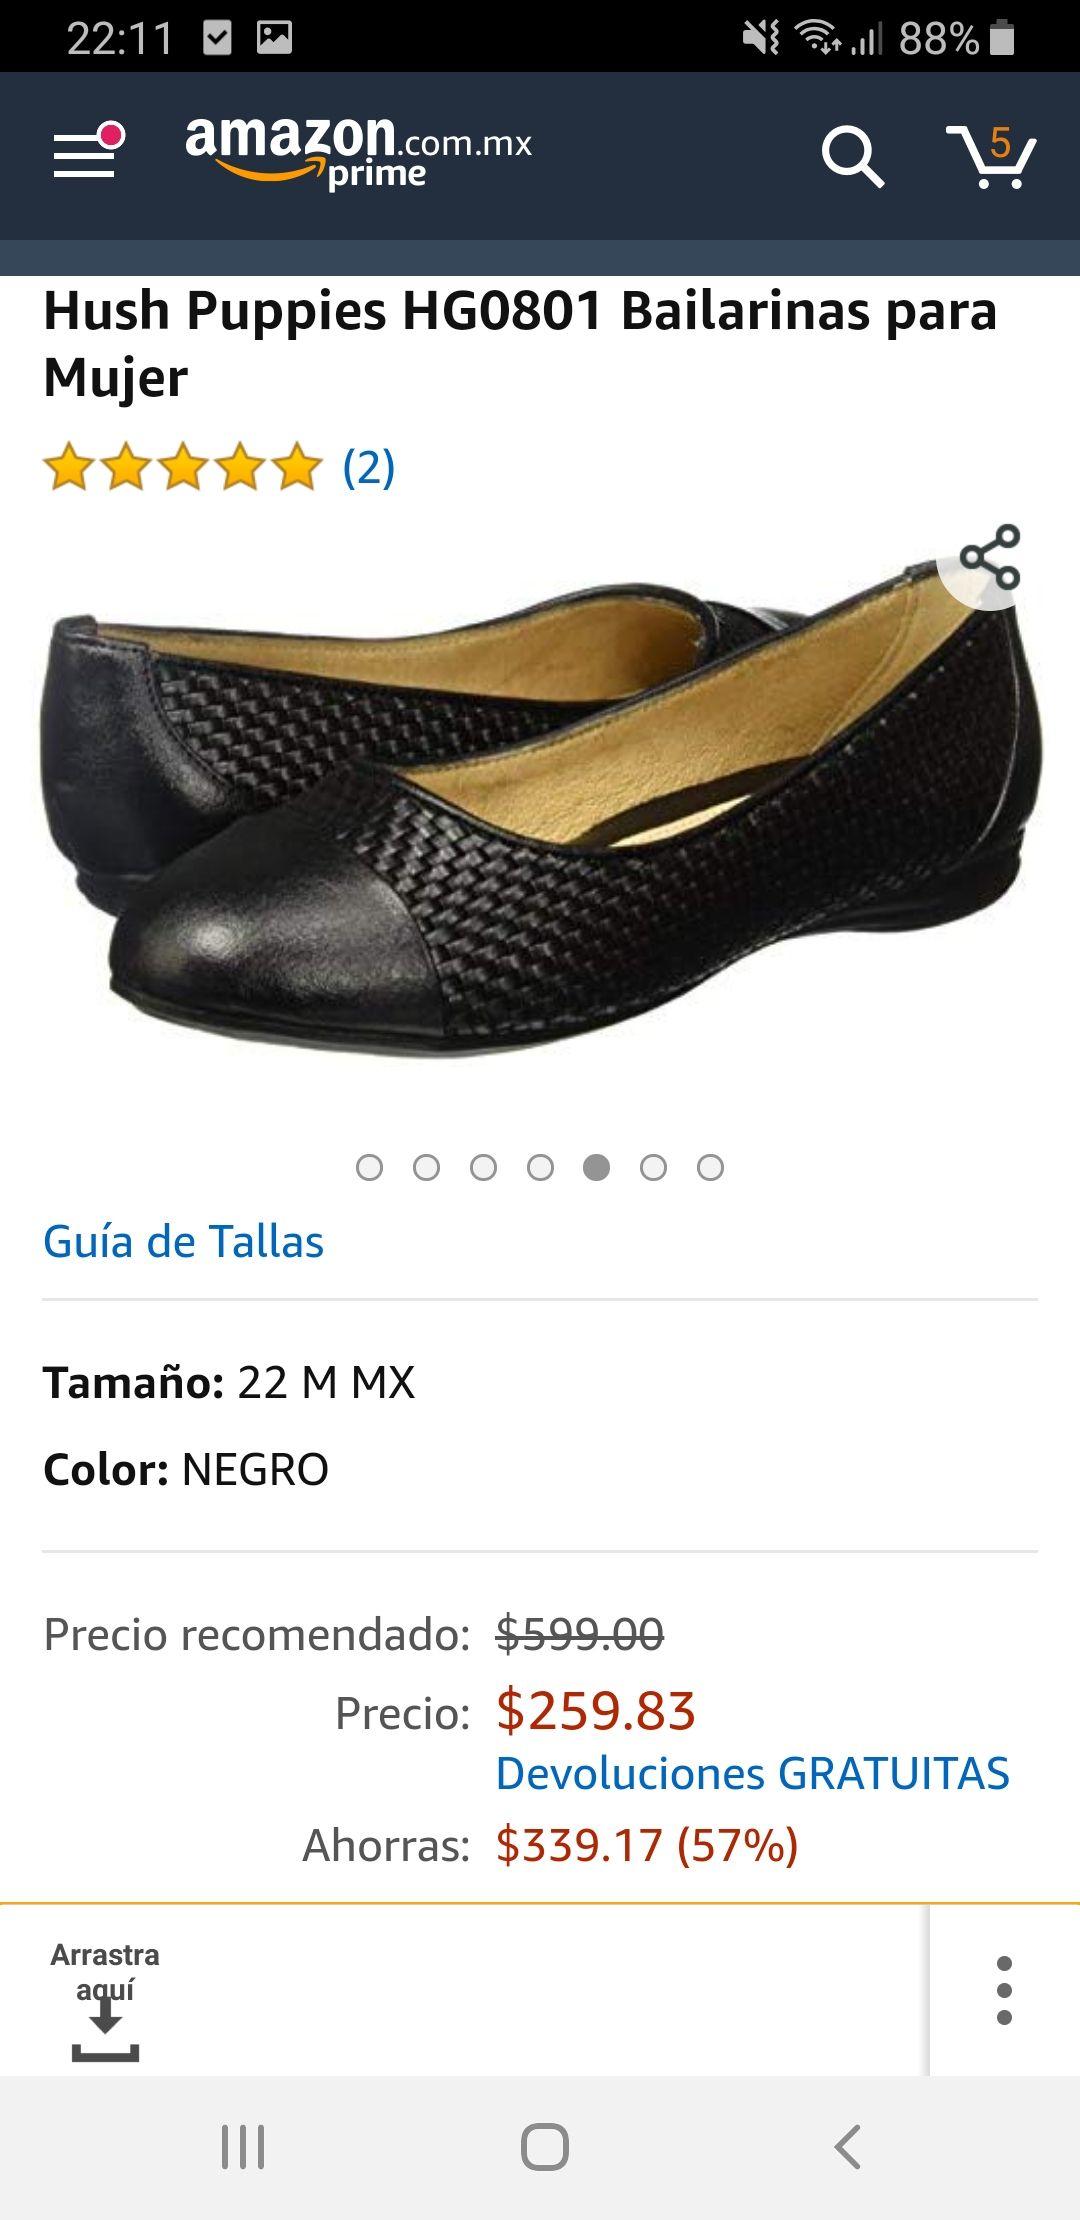 Amazon MX: Hush puppies mujer no. 2